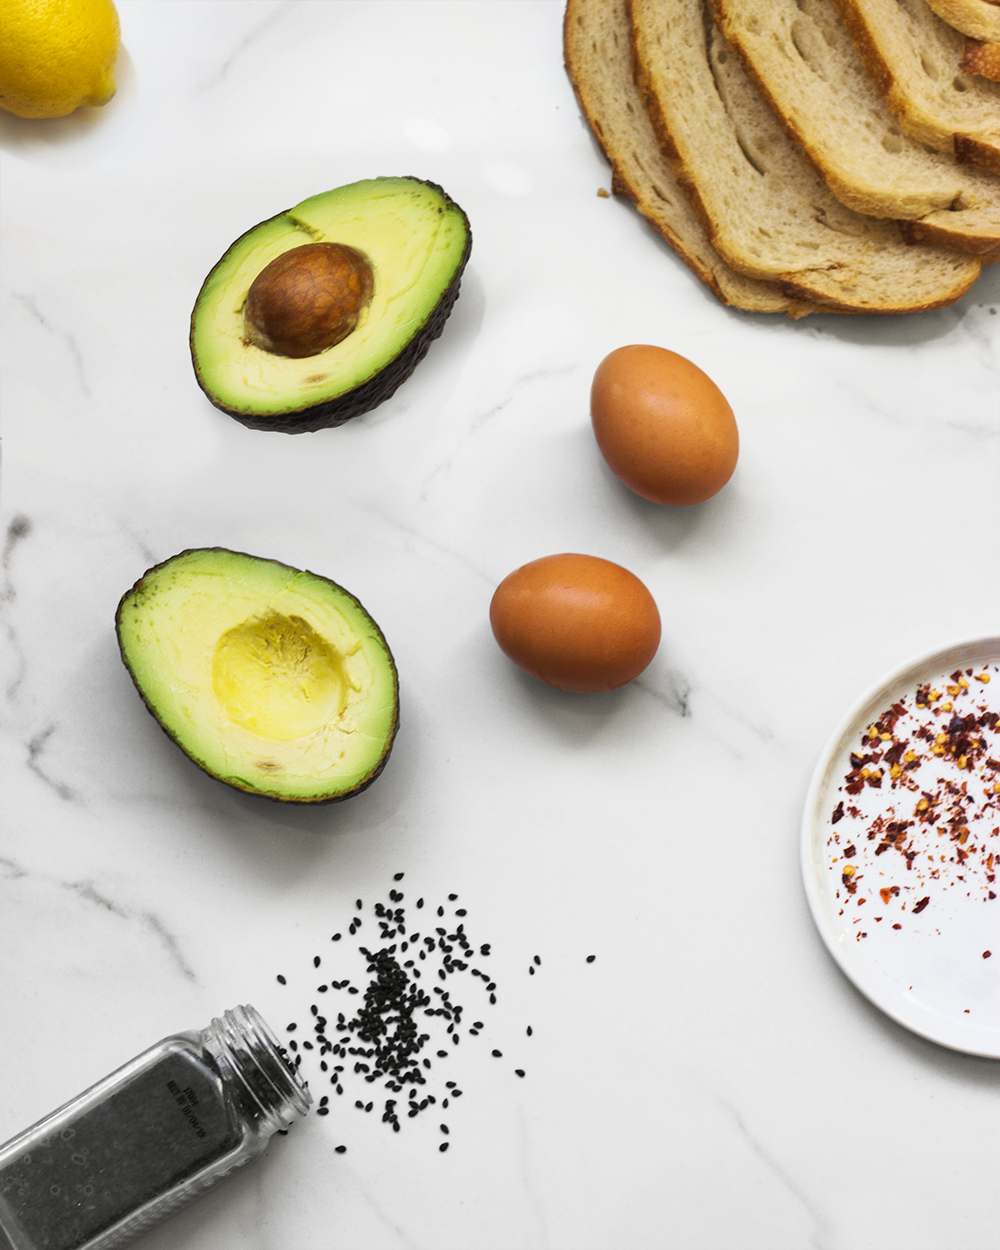 livvyland-blog-olivia-watson-ultimate-avocado-toast-recipe-best-avo-breakfast-idea-jessica-lee-2